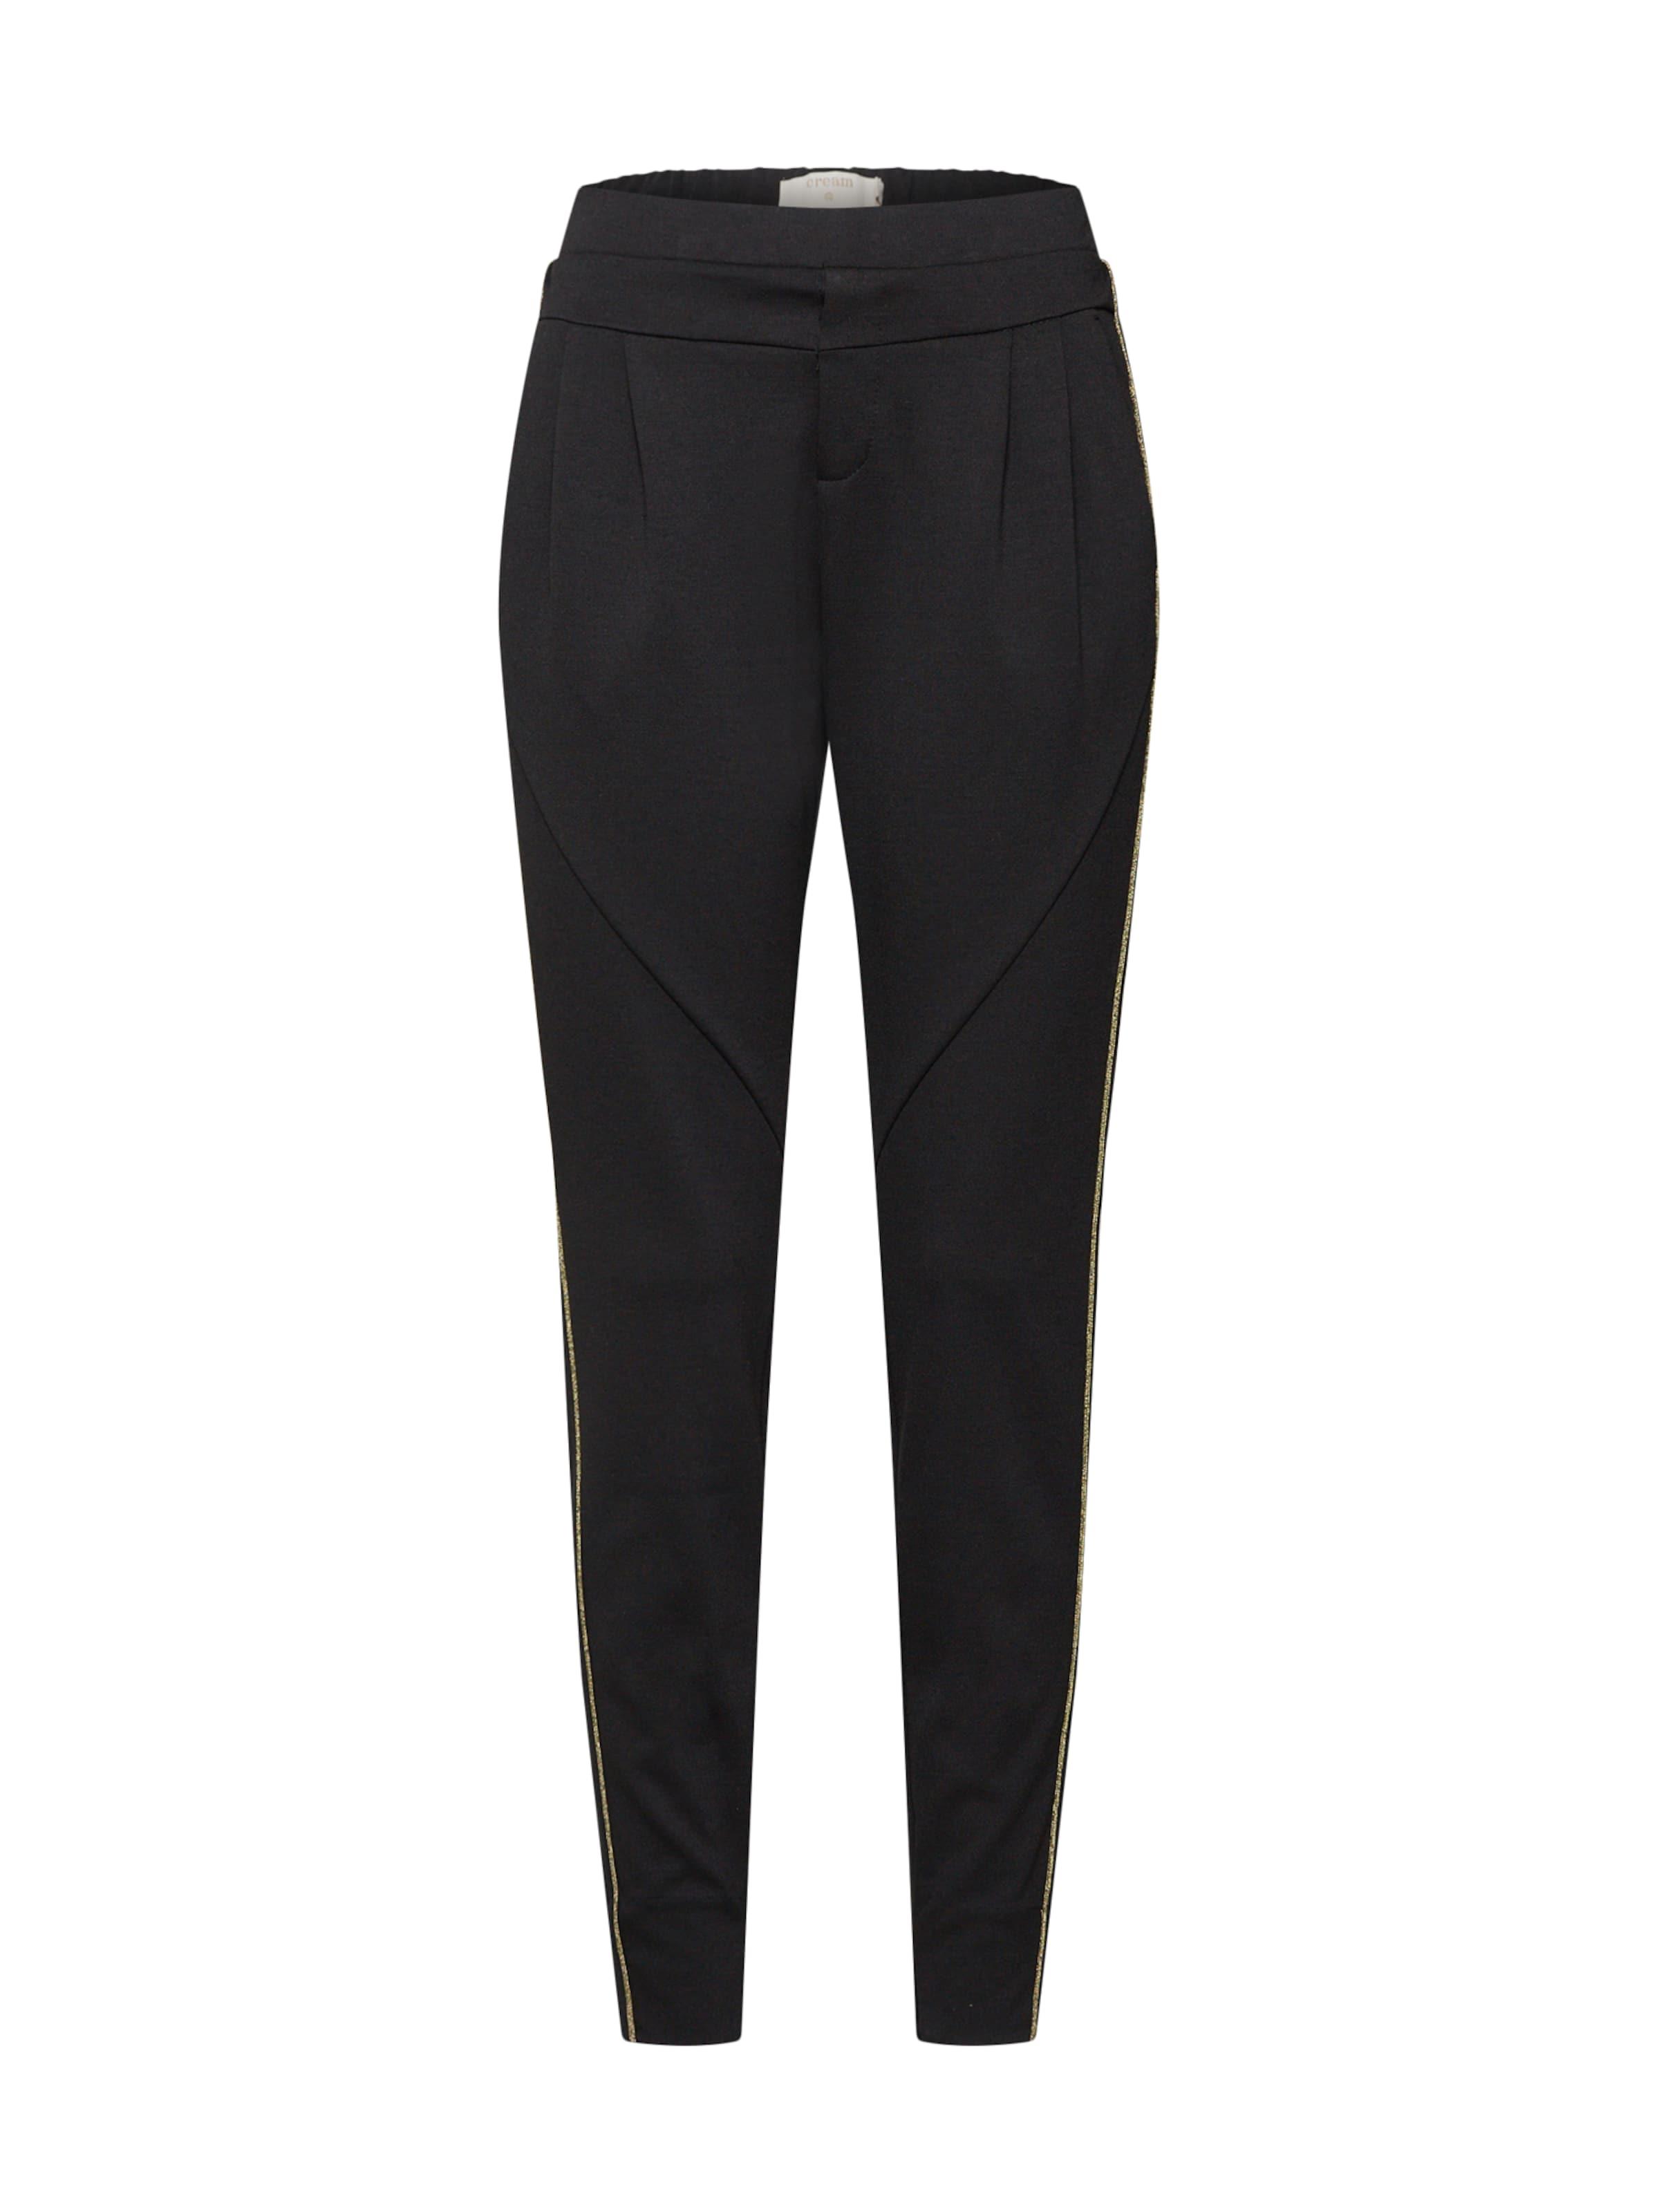 Pantalon Noir En Pantalon Noir Cream Cream En Cream En Cream Pantalon Pantalon Noir FTJc13lK